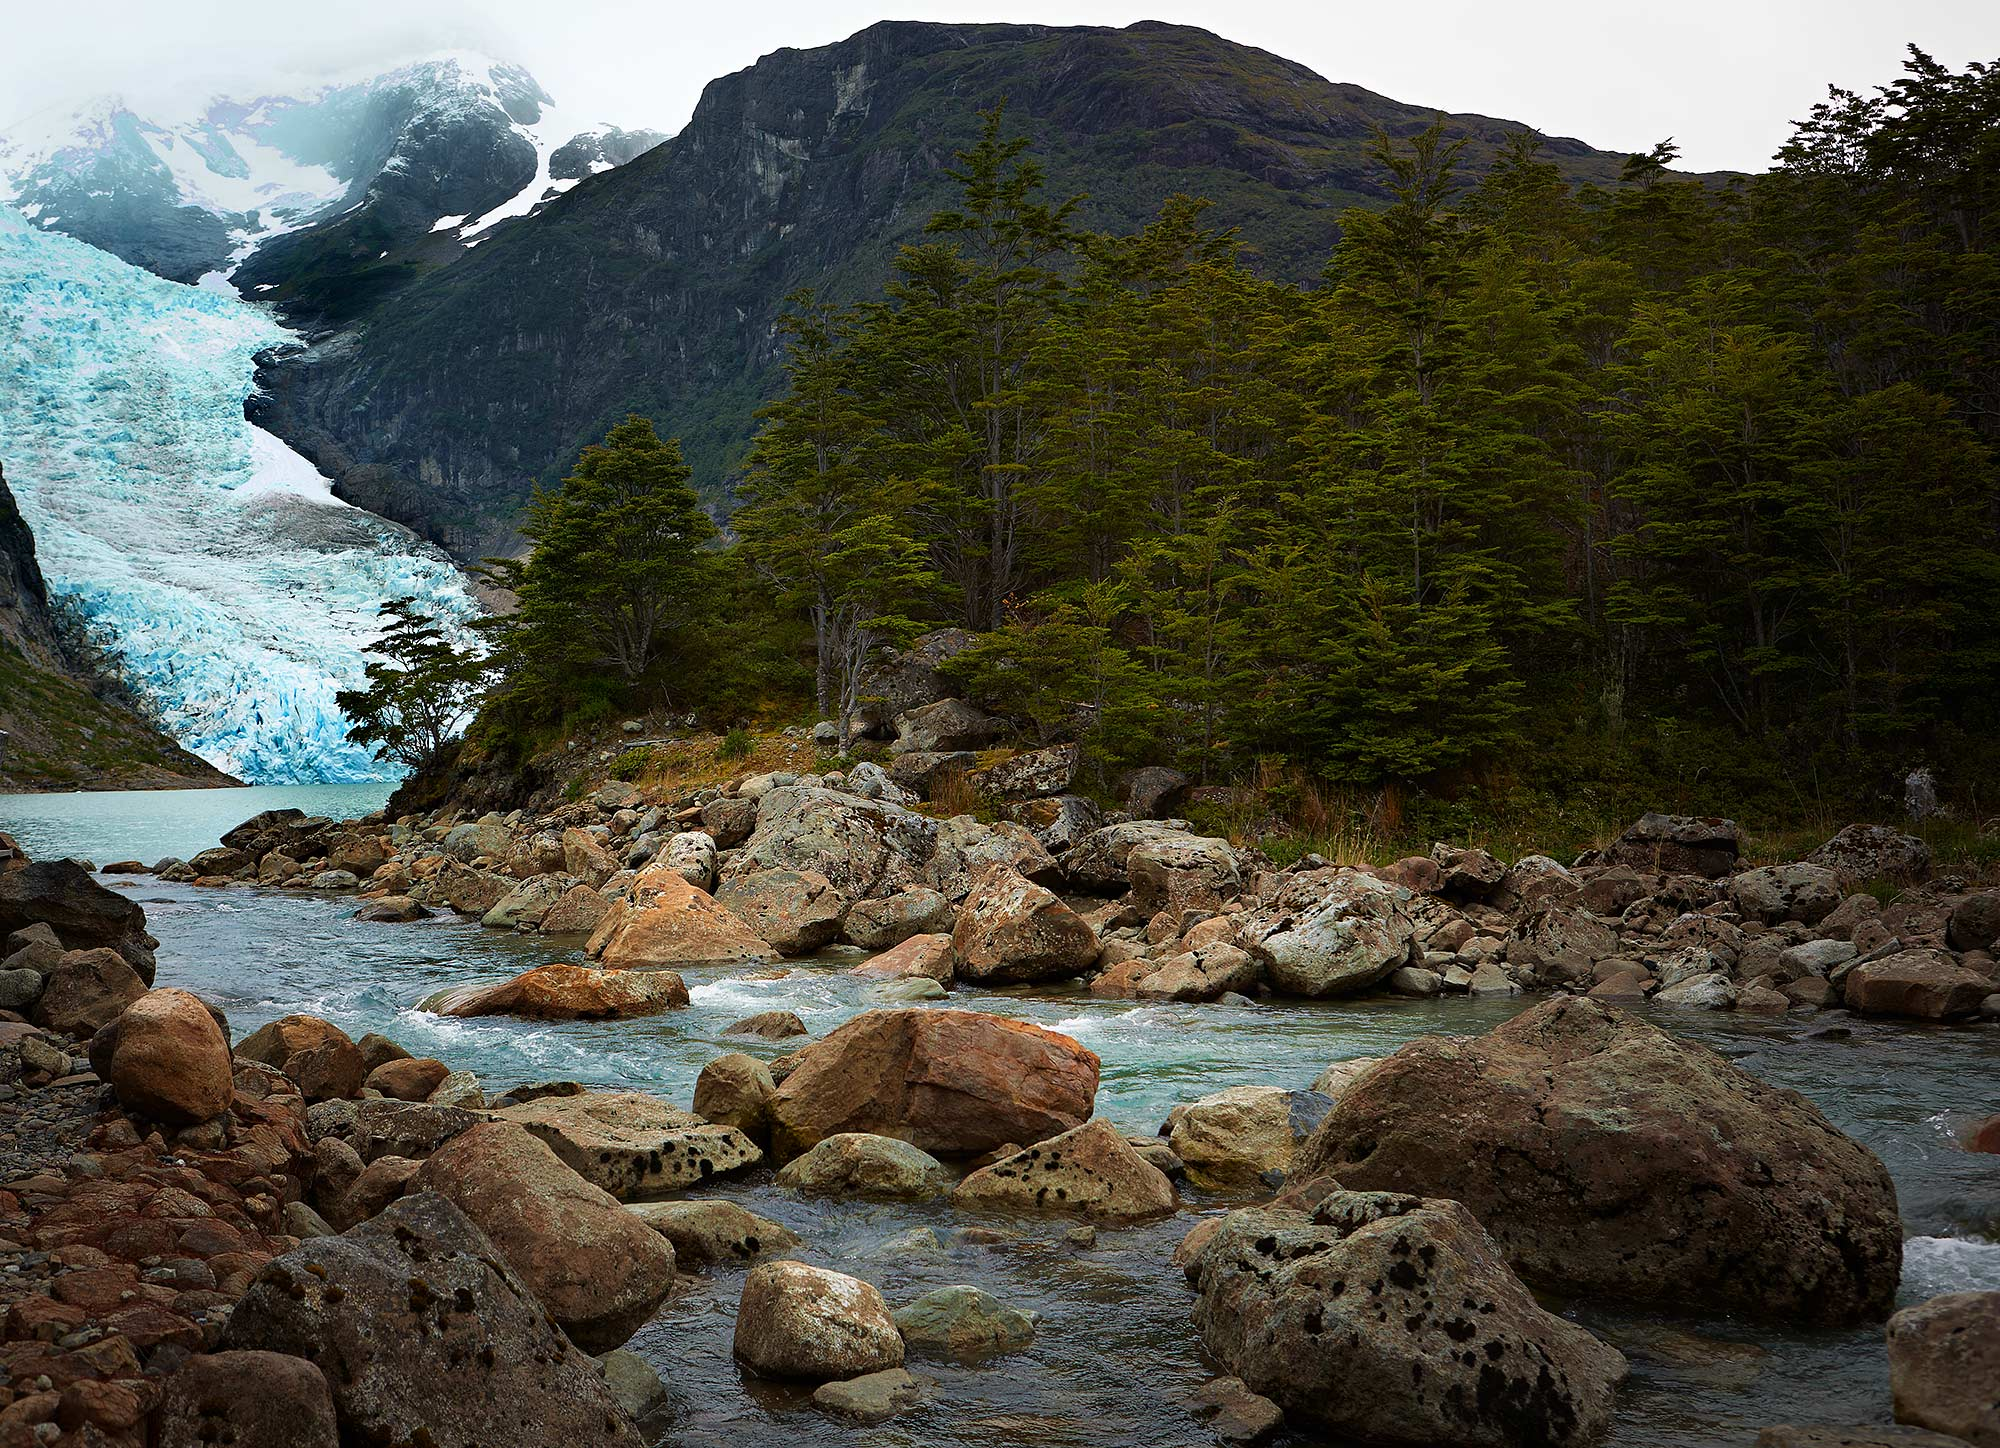 jeremy-frechette-Patagonia-Chile-glacier-02_987-HP.jpg